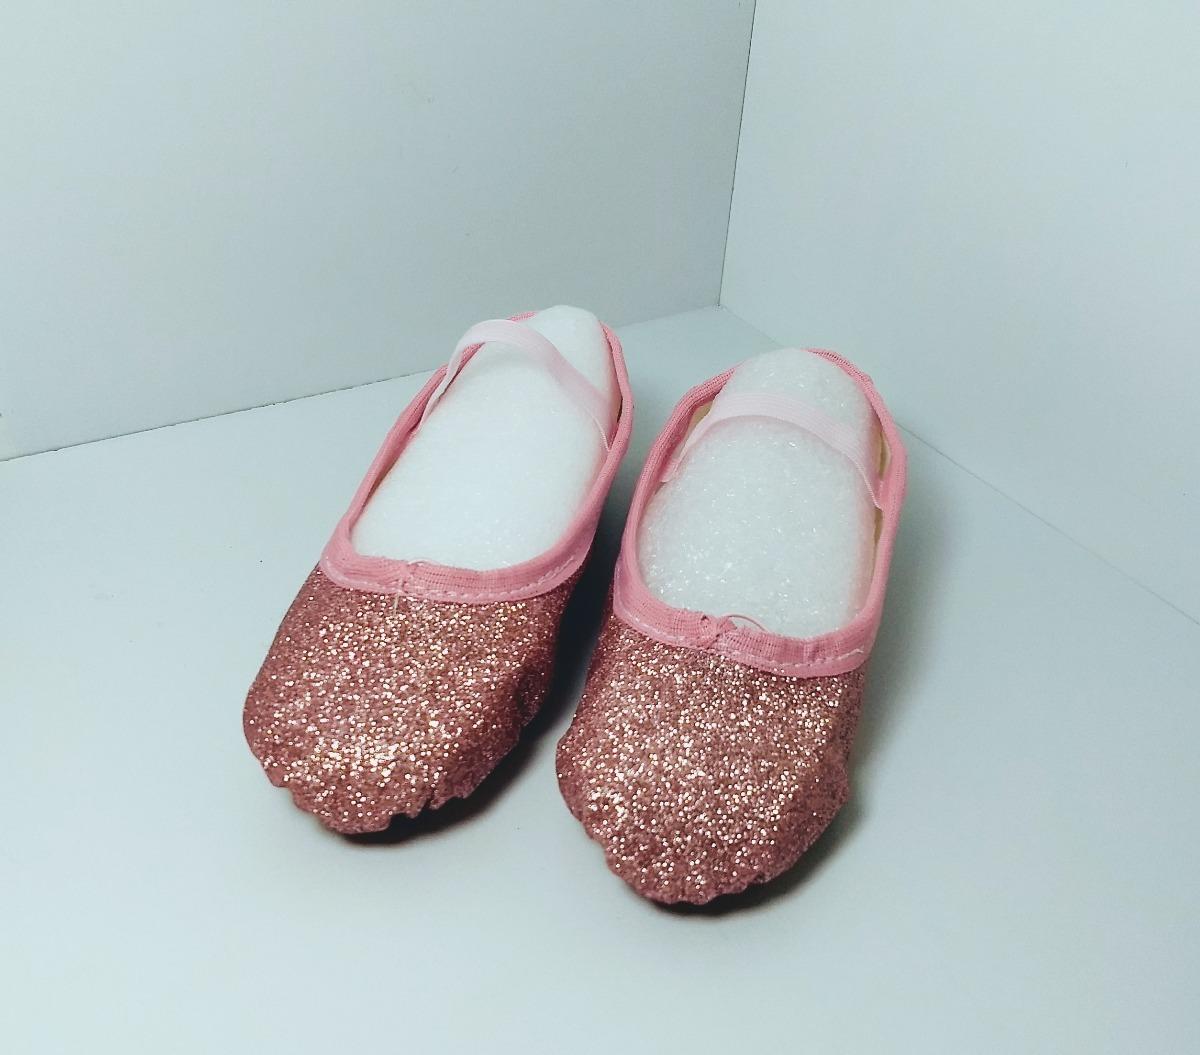 be3b67141c sapatilha ballet glitter infantil ou adulto balé rosa. Carregando zoom.